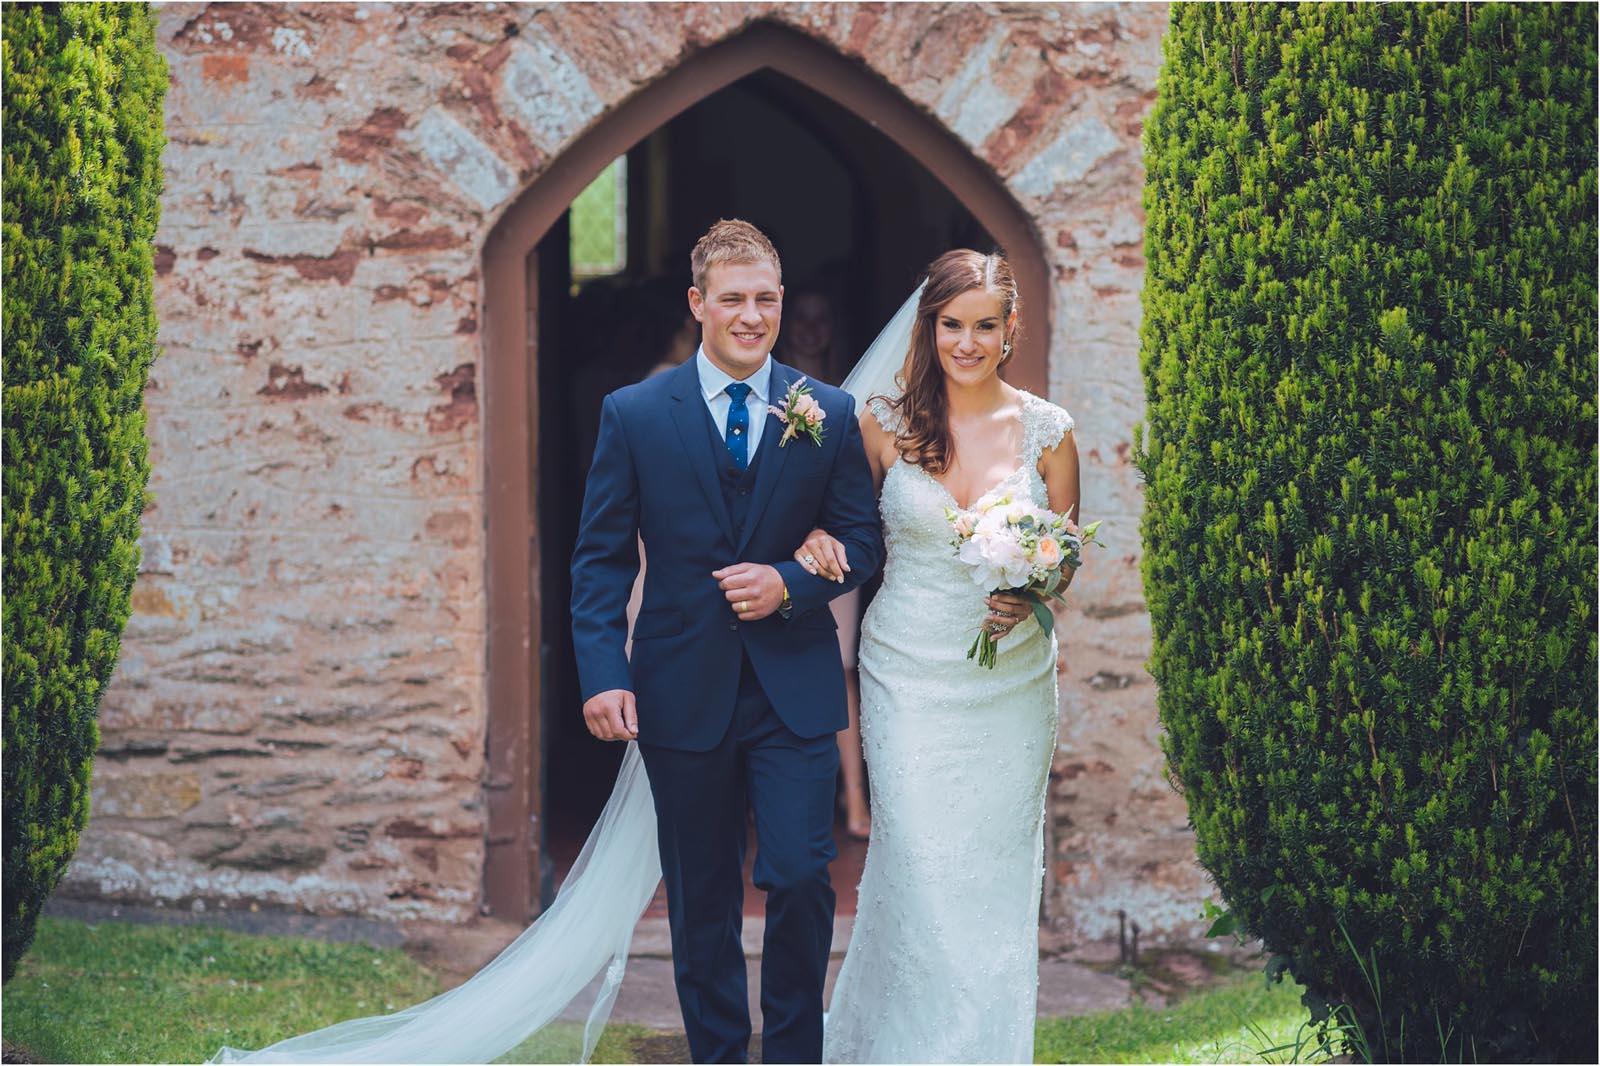 Simon biffen wedding photography 0070